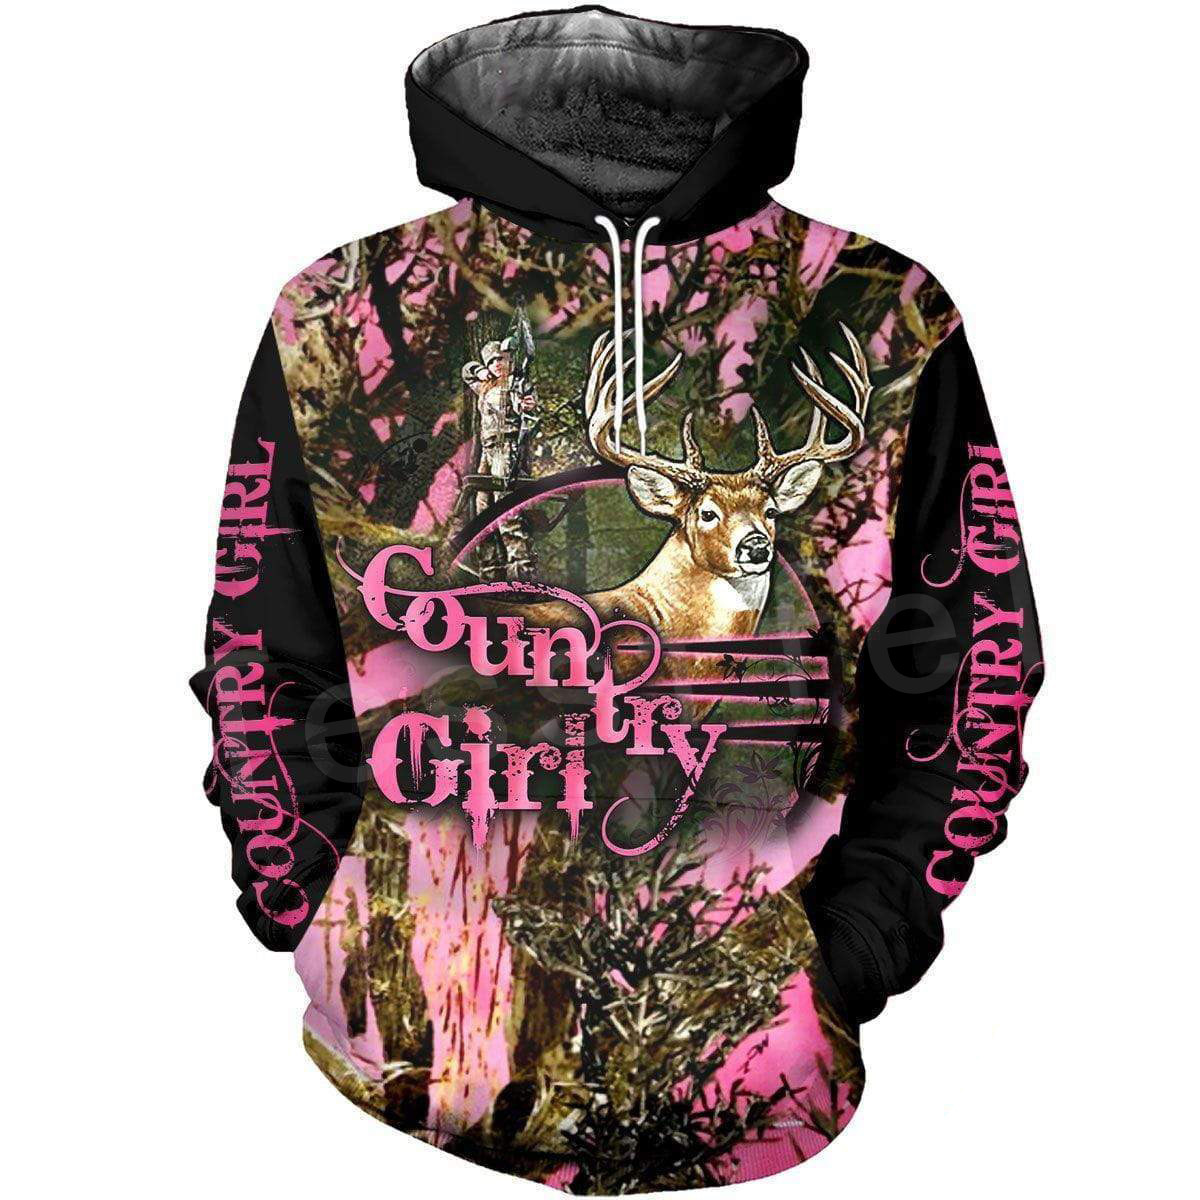 Tessffel Animal Deer Hunter Colorful Camo New Fashion Tracksuit Casual 3DPrint Hoodie/Sweatshirt/Jacket/Mens Womens S-1